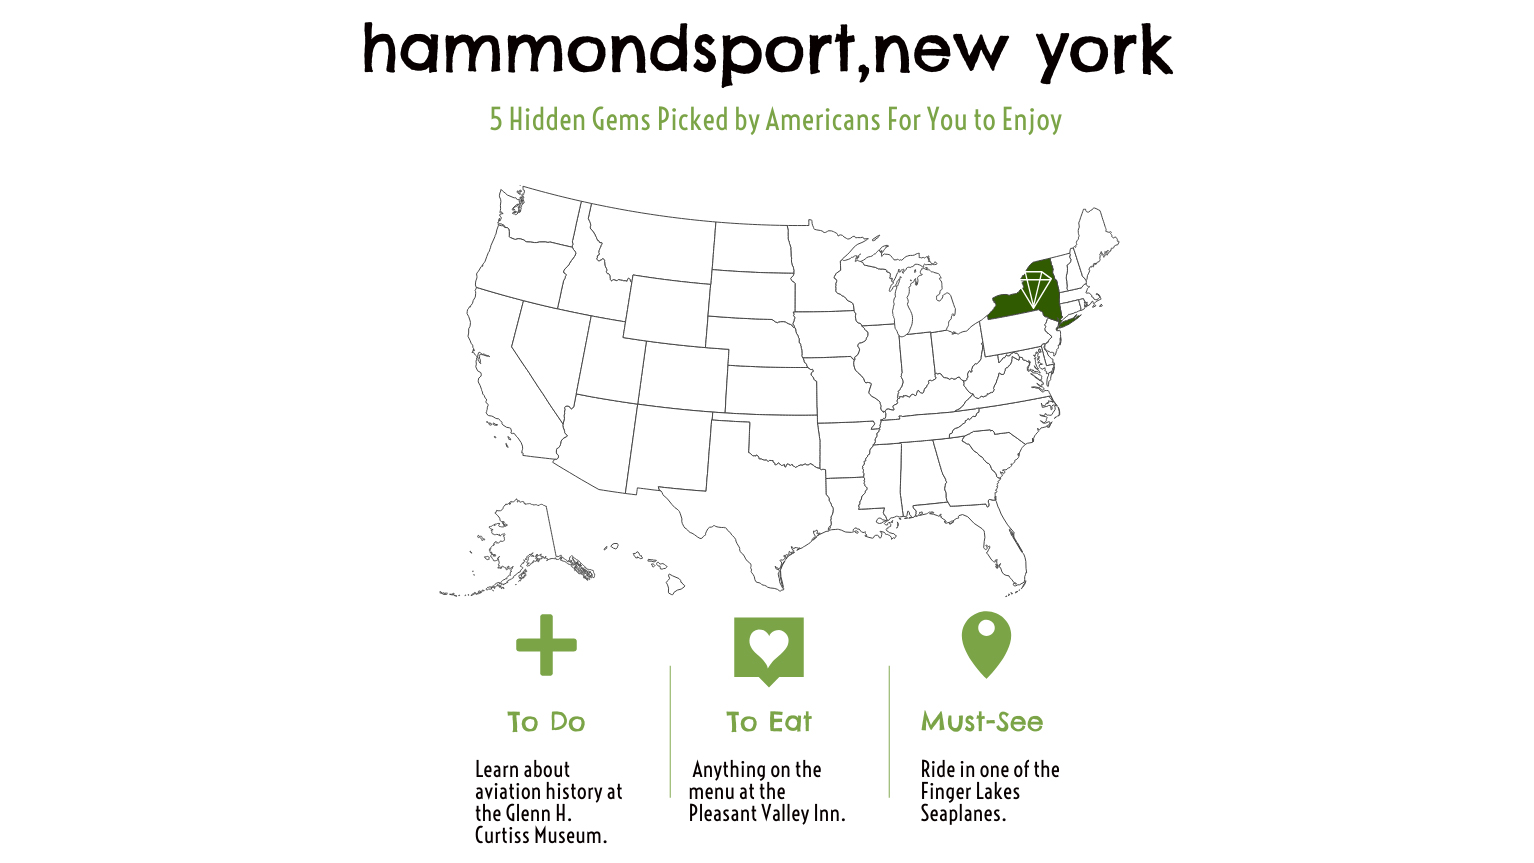 Hammondsport169_1538679964245.jpg